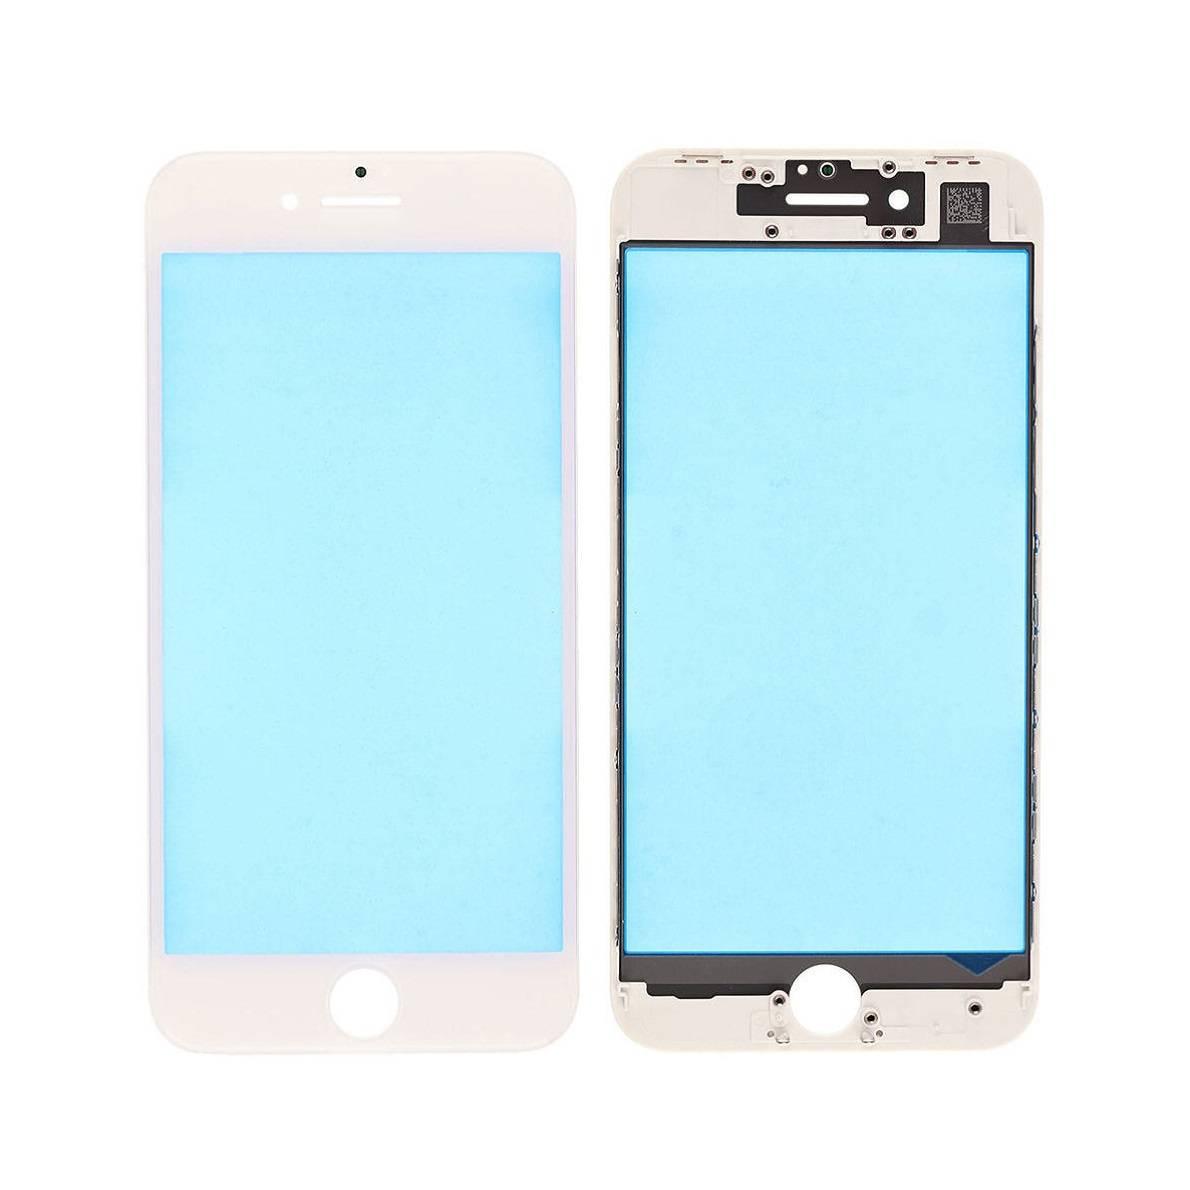 ЗАПЧАСТИ для APPLE :: ЗАПЧАСТИ для APPLE IPHONE :: СТЕКЛО+РАМКА+КЛЕЙ OCA для iPhone :: Стекло+рамка+клей OCA для iPhone 8 Plus (белый)